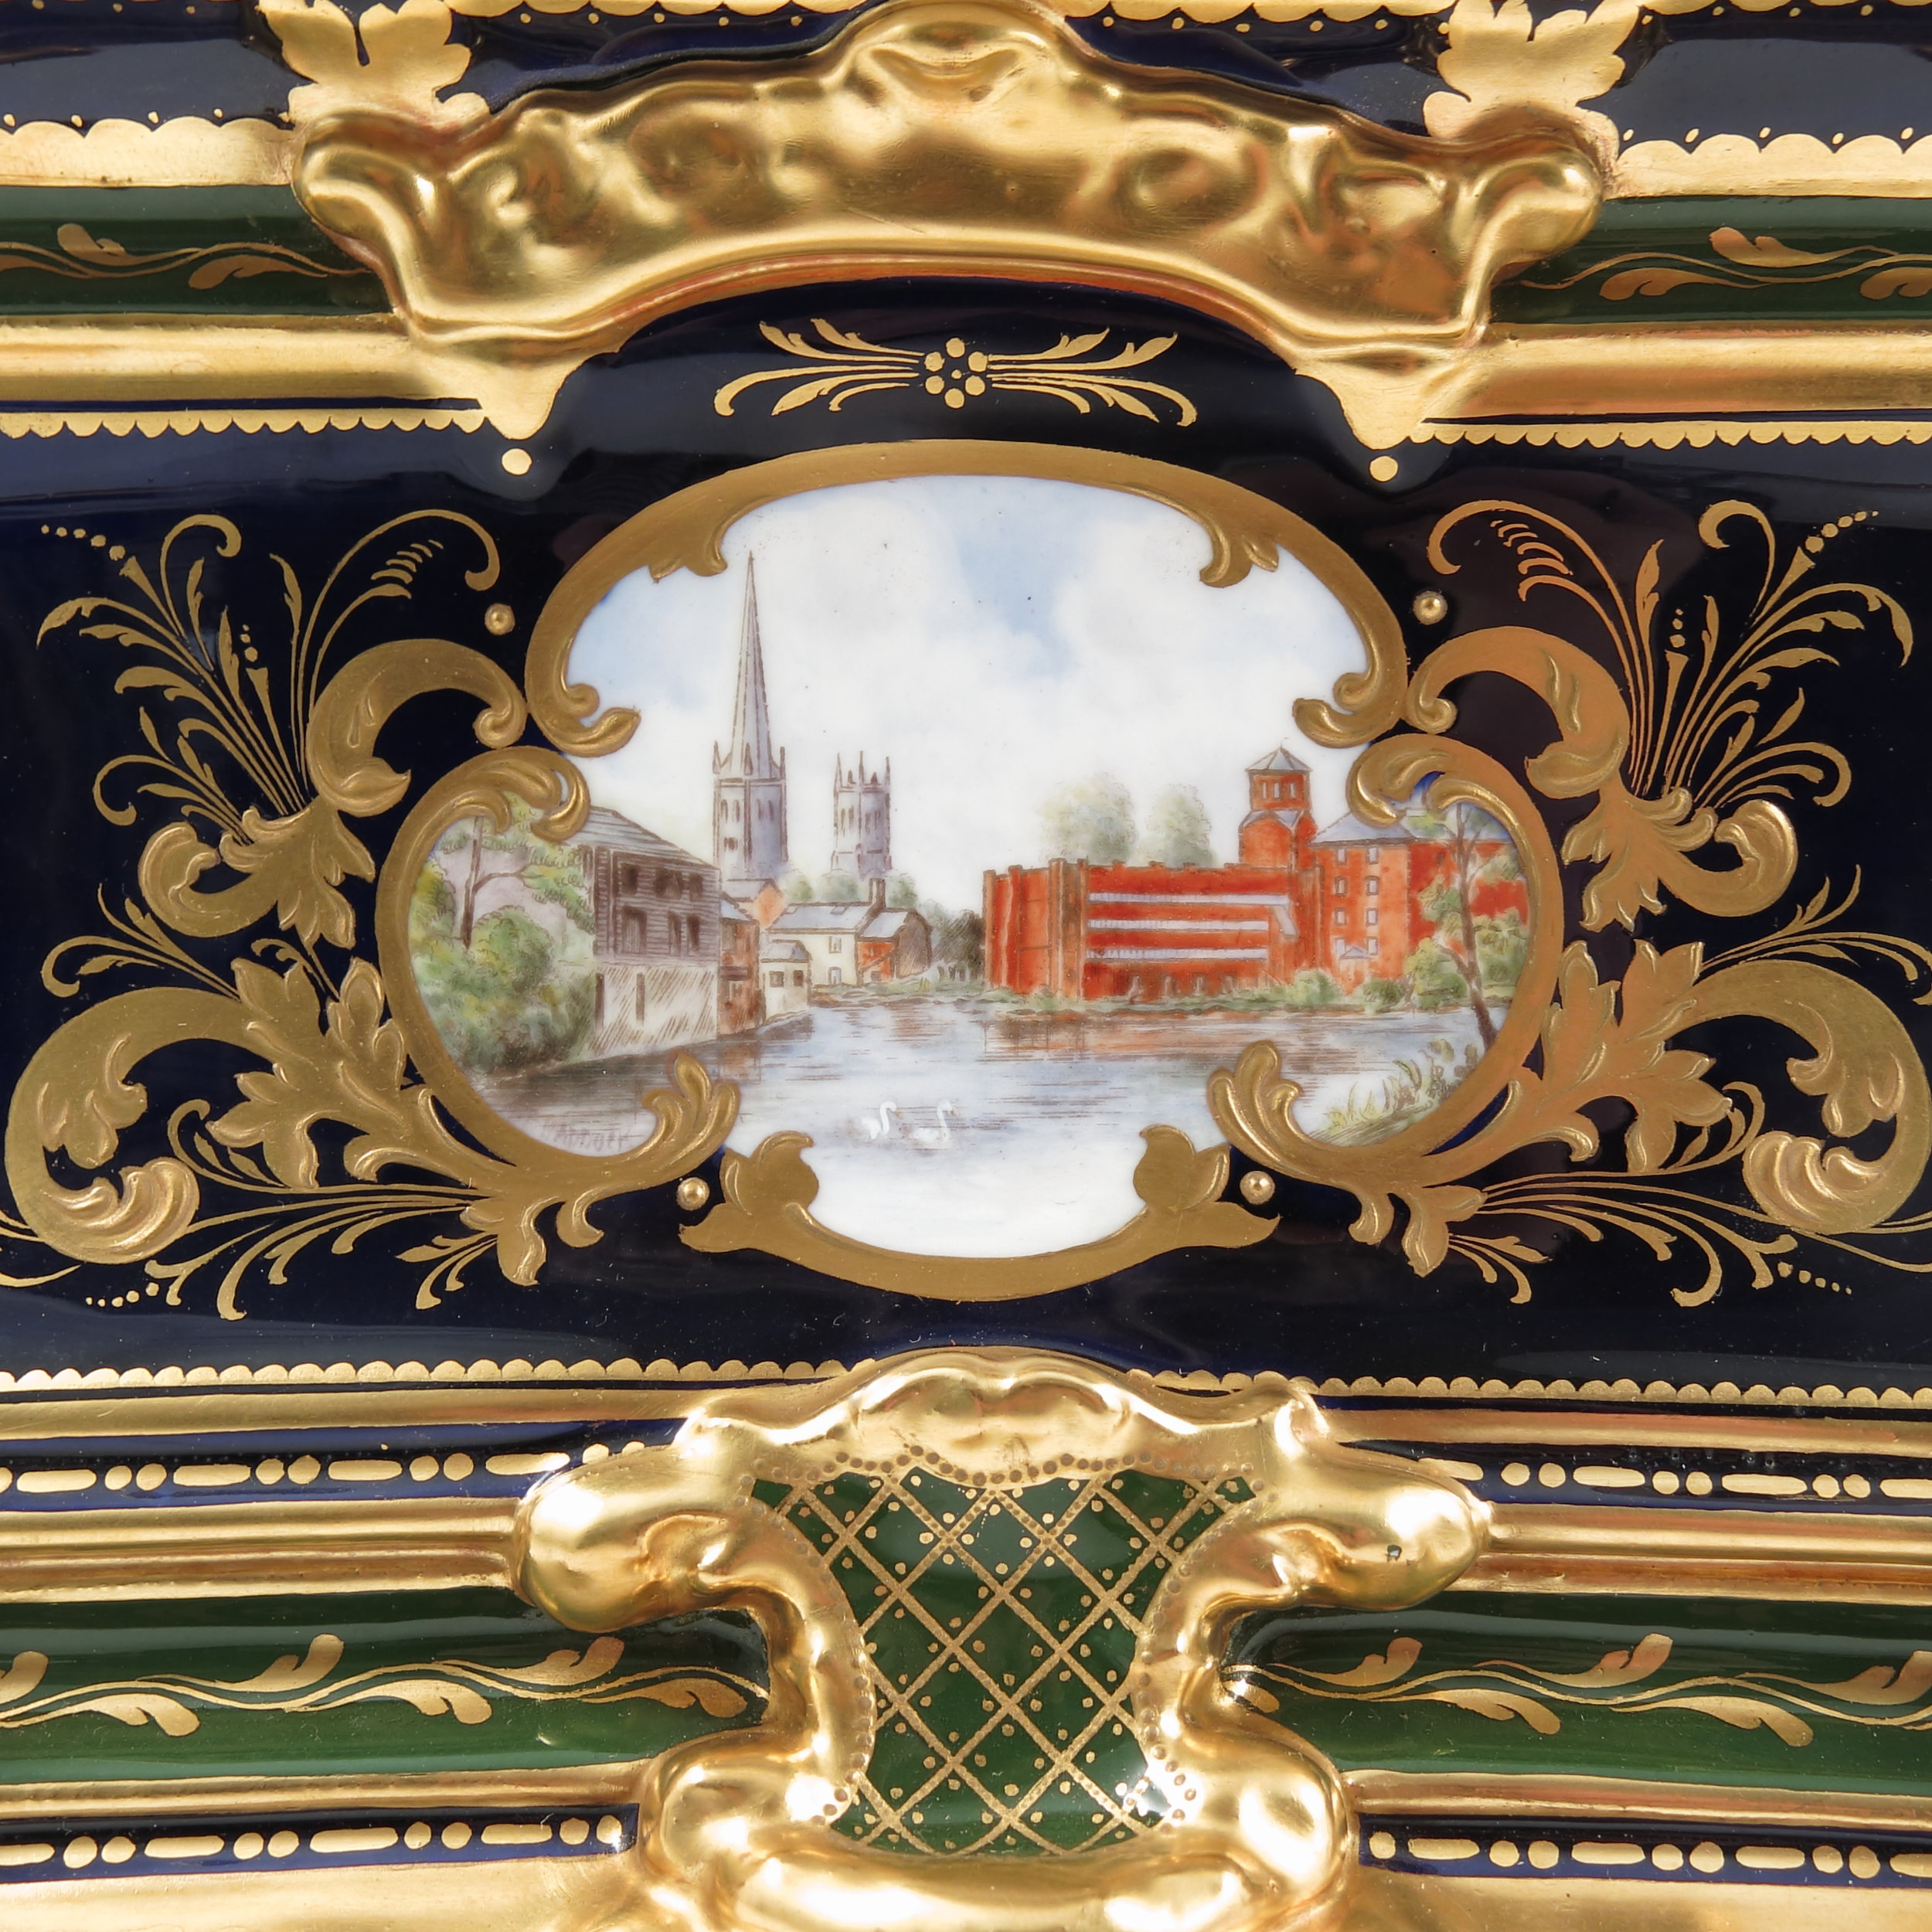 royal-crown-derby-freedom-casket-side-panel-2